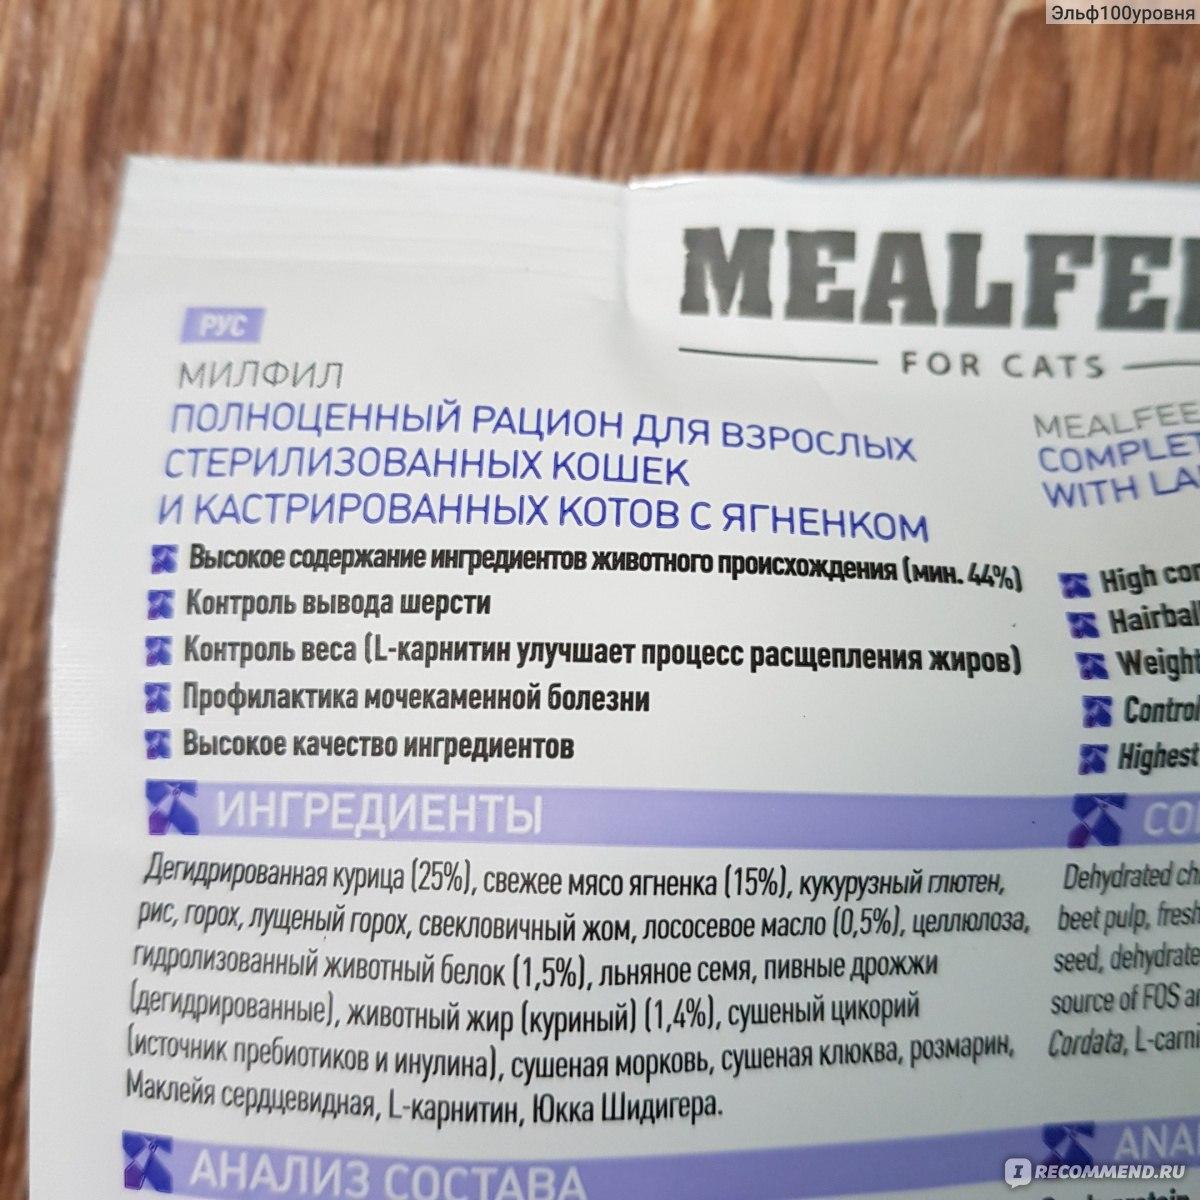 Обзор кормов марки «Милфил»